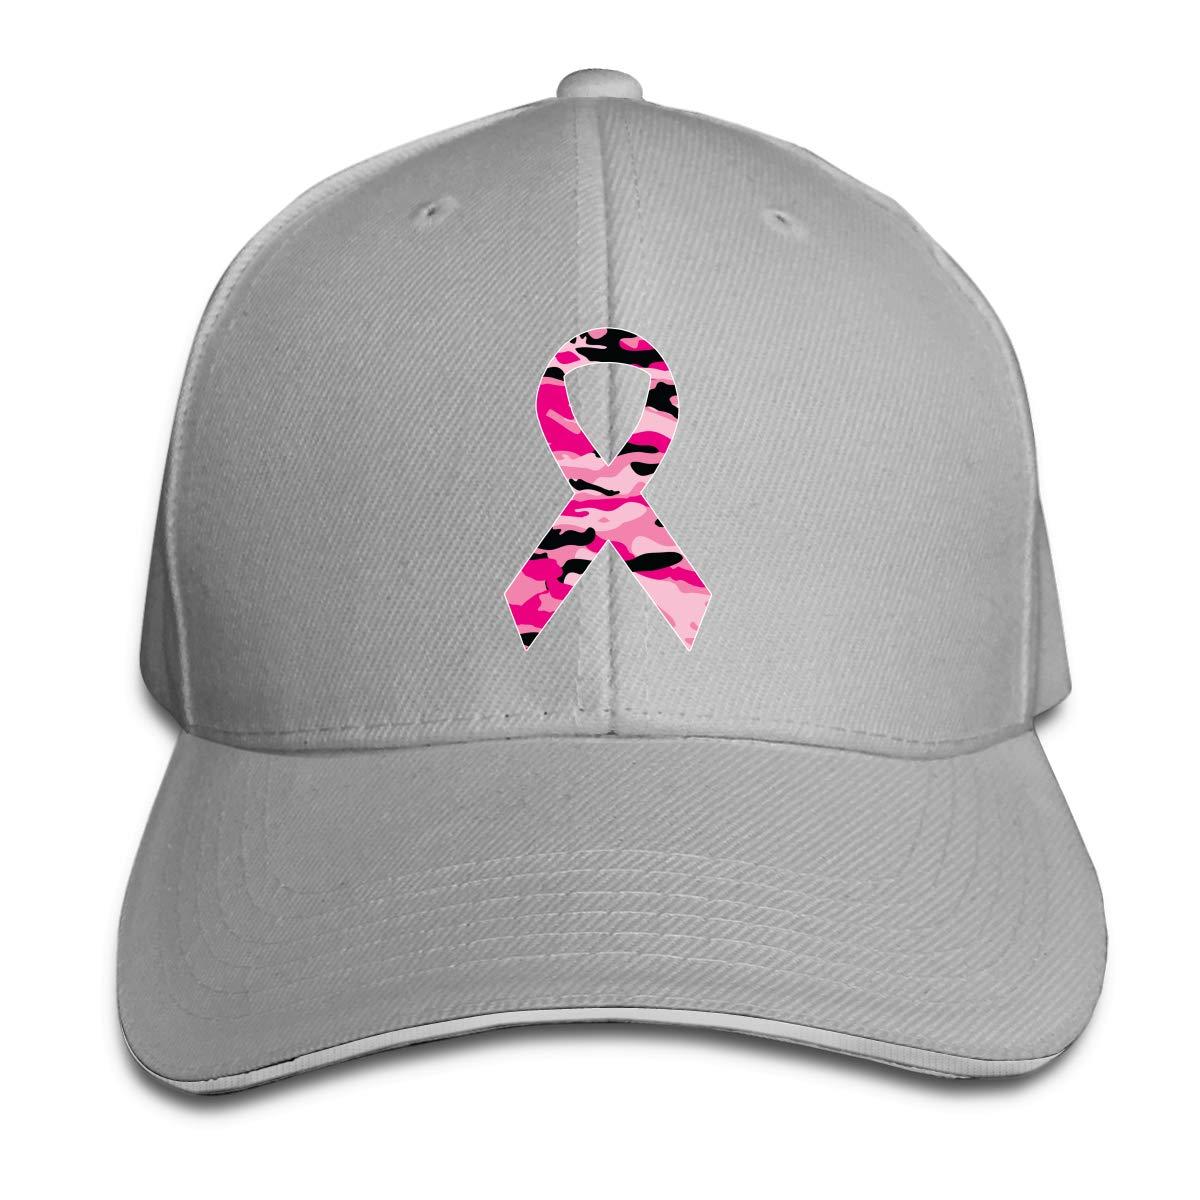 WFIRE Adult Baseball Caps Carmouflage Pink Ribbon Custom Adjustable Sandwich Cap Casquette Hats